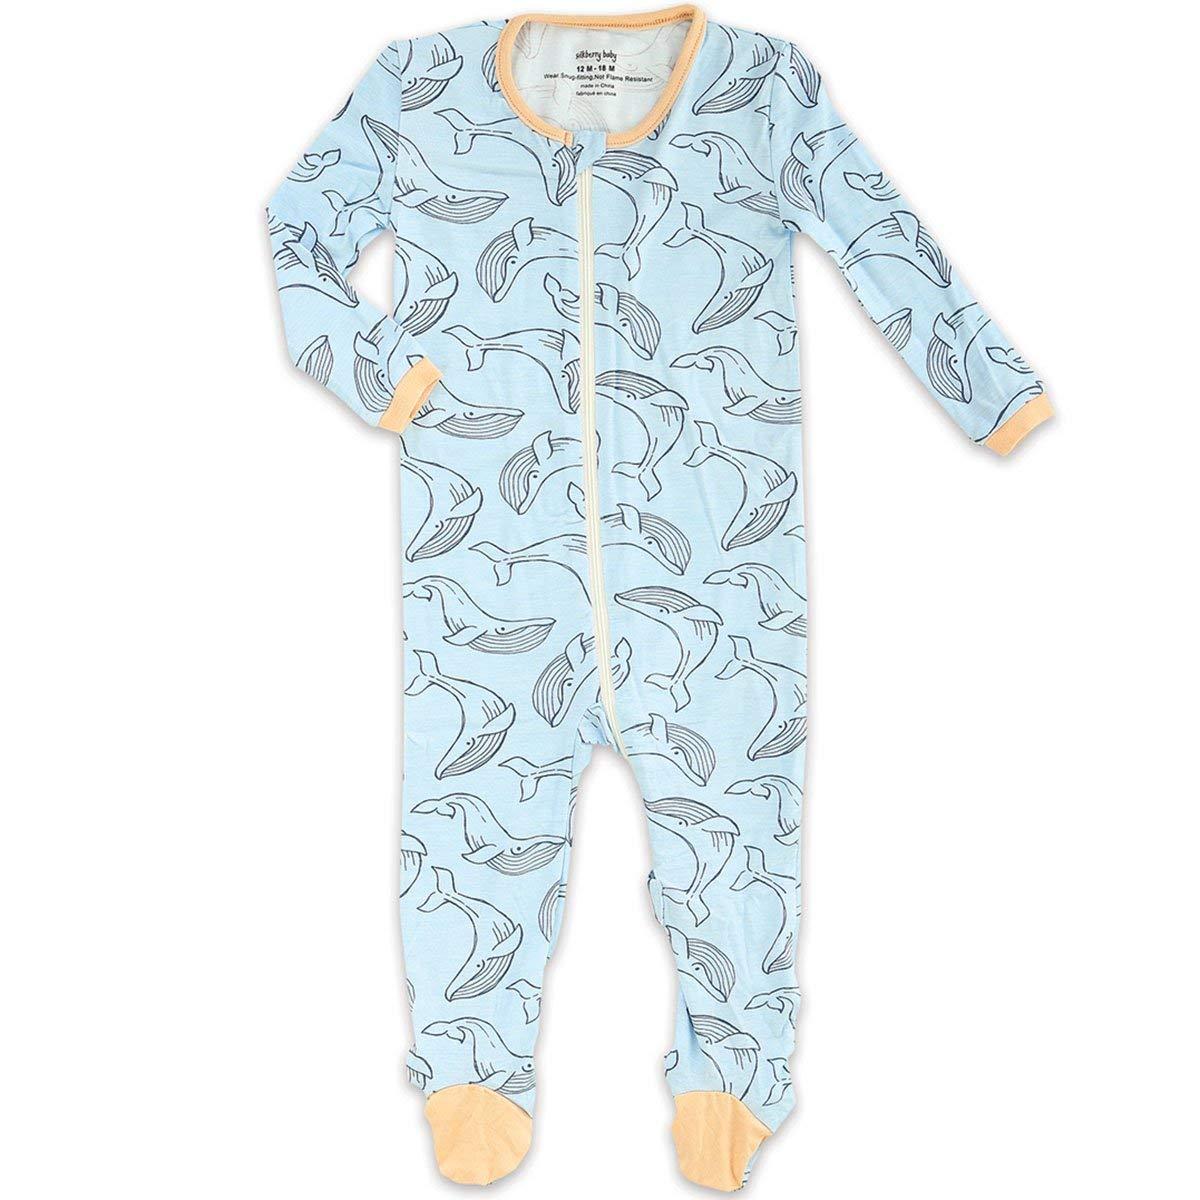 Silkberry Baby Bamboo Unisex-Baby Newborn Footie Sleeper